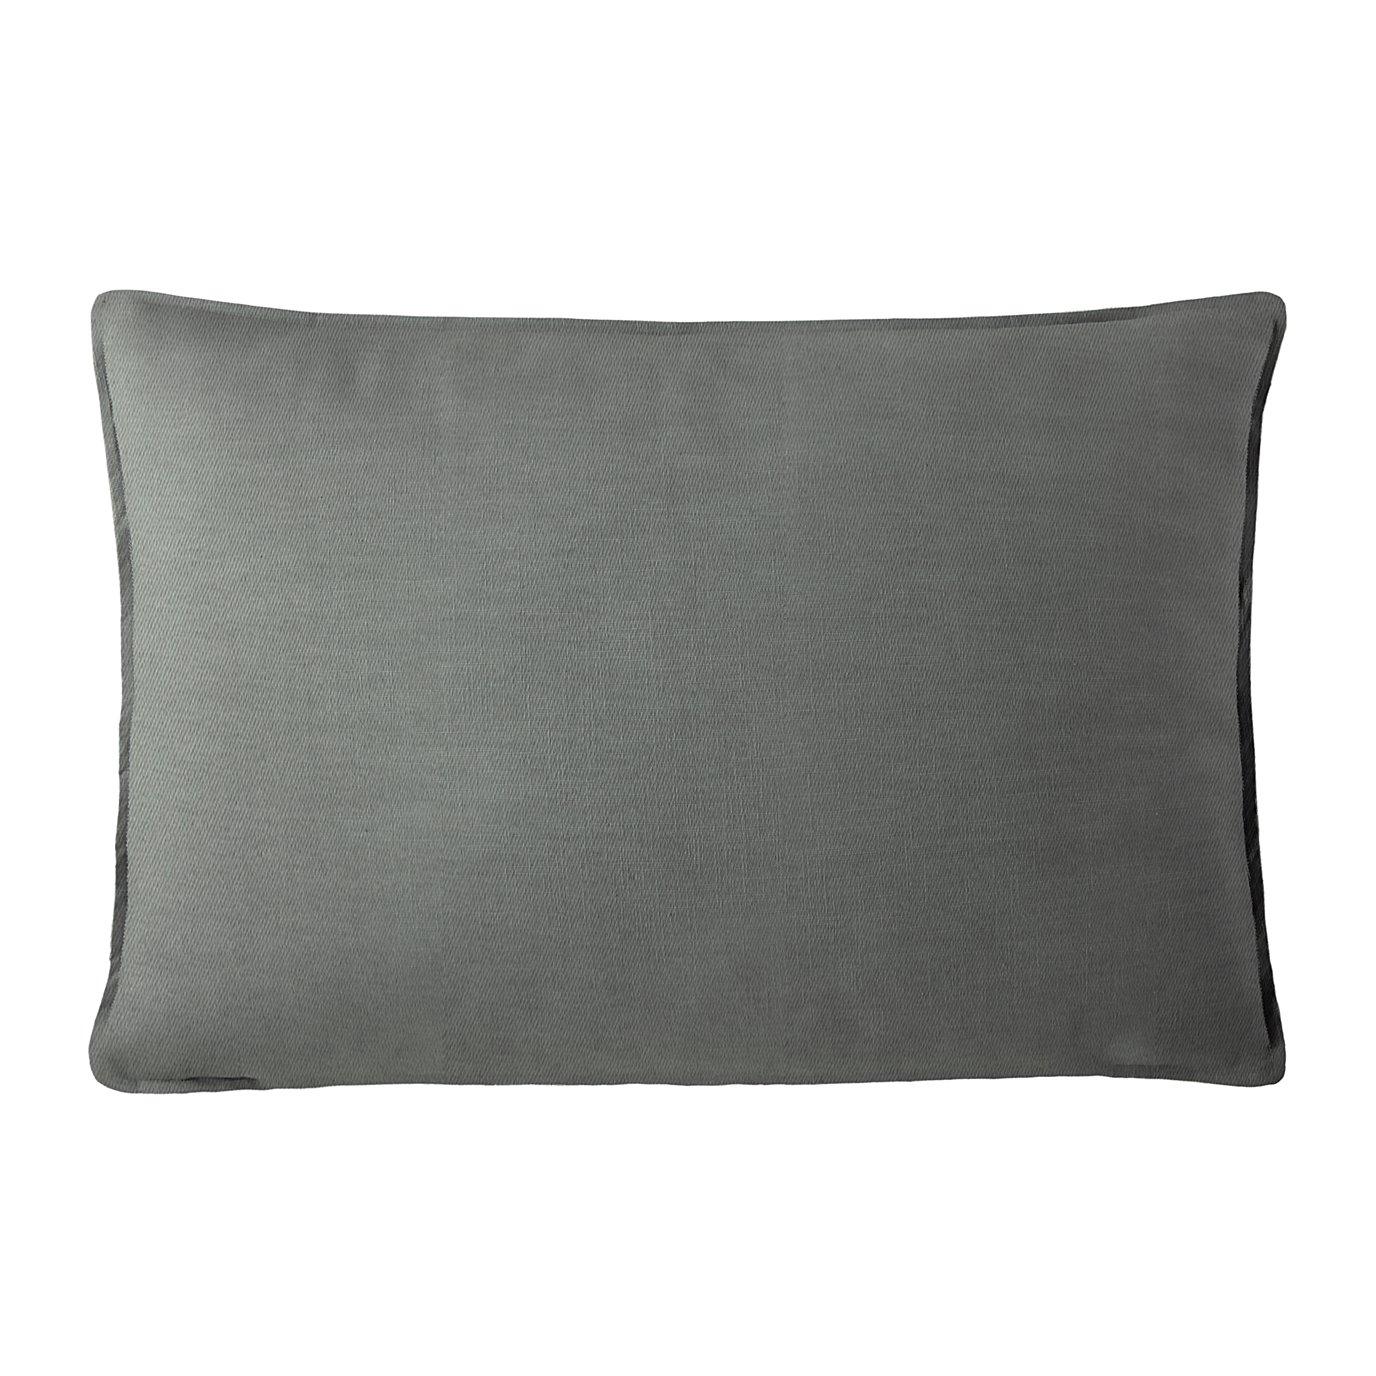 "Harrow Charcoal Rectangle Pillow 14""x22"""